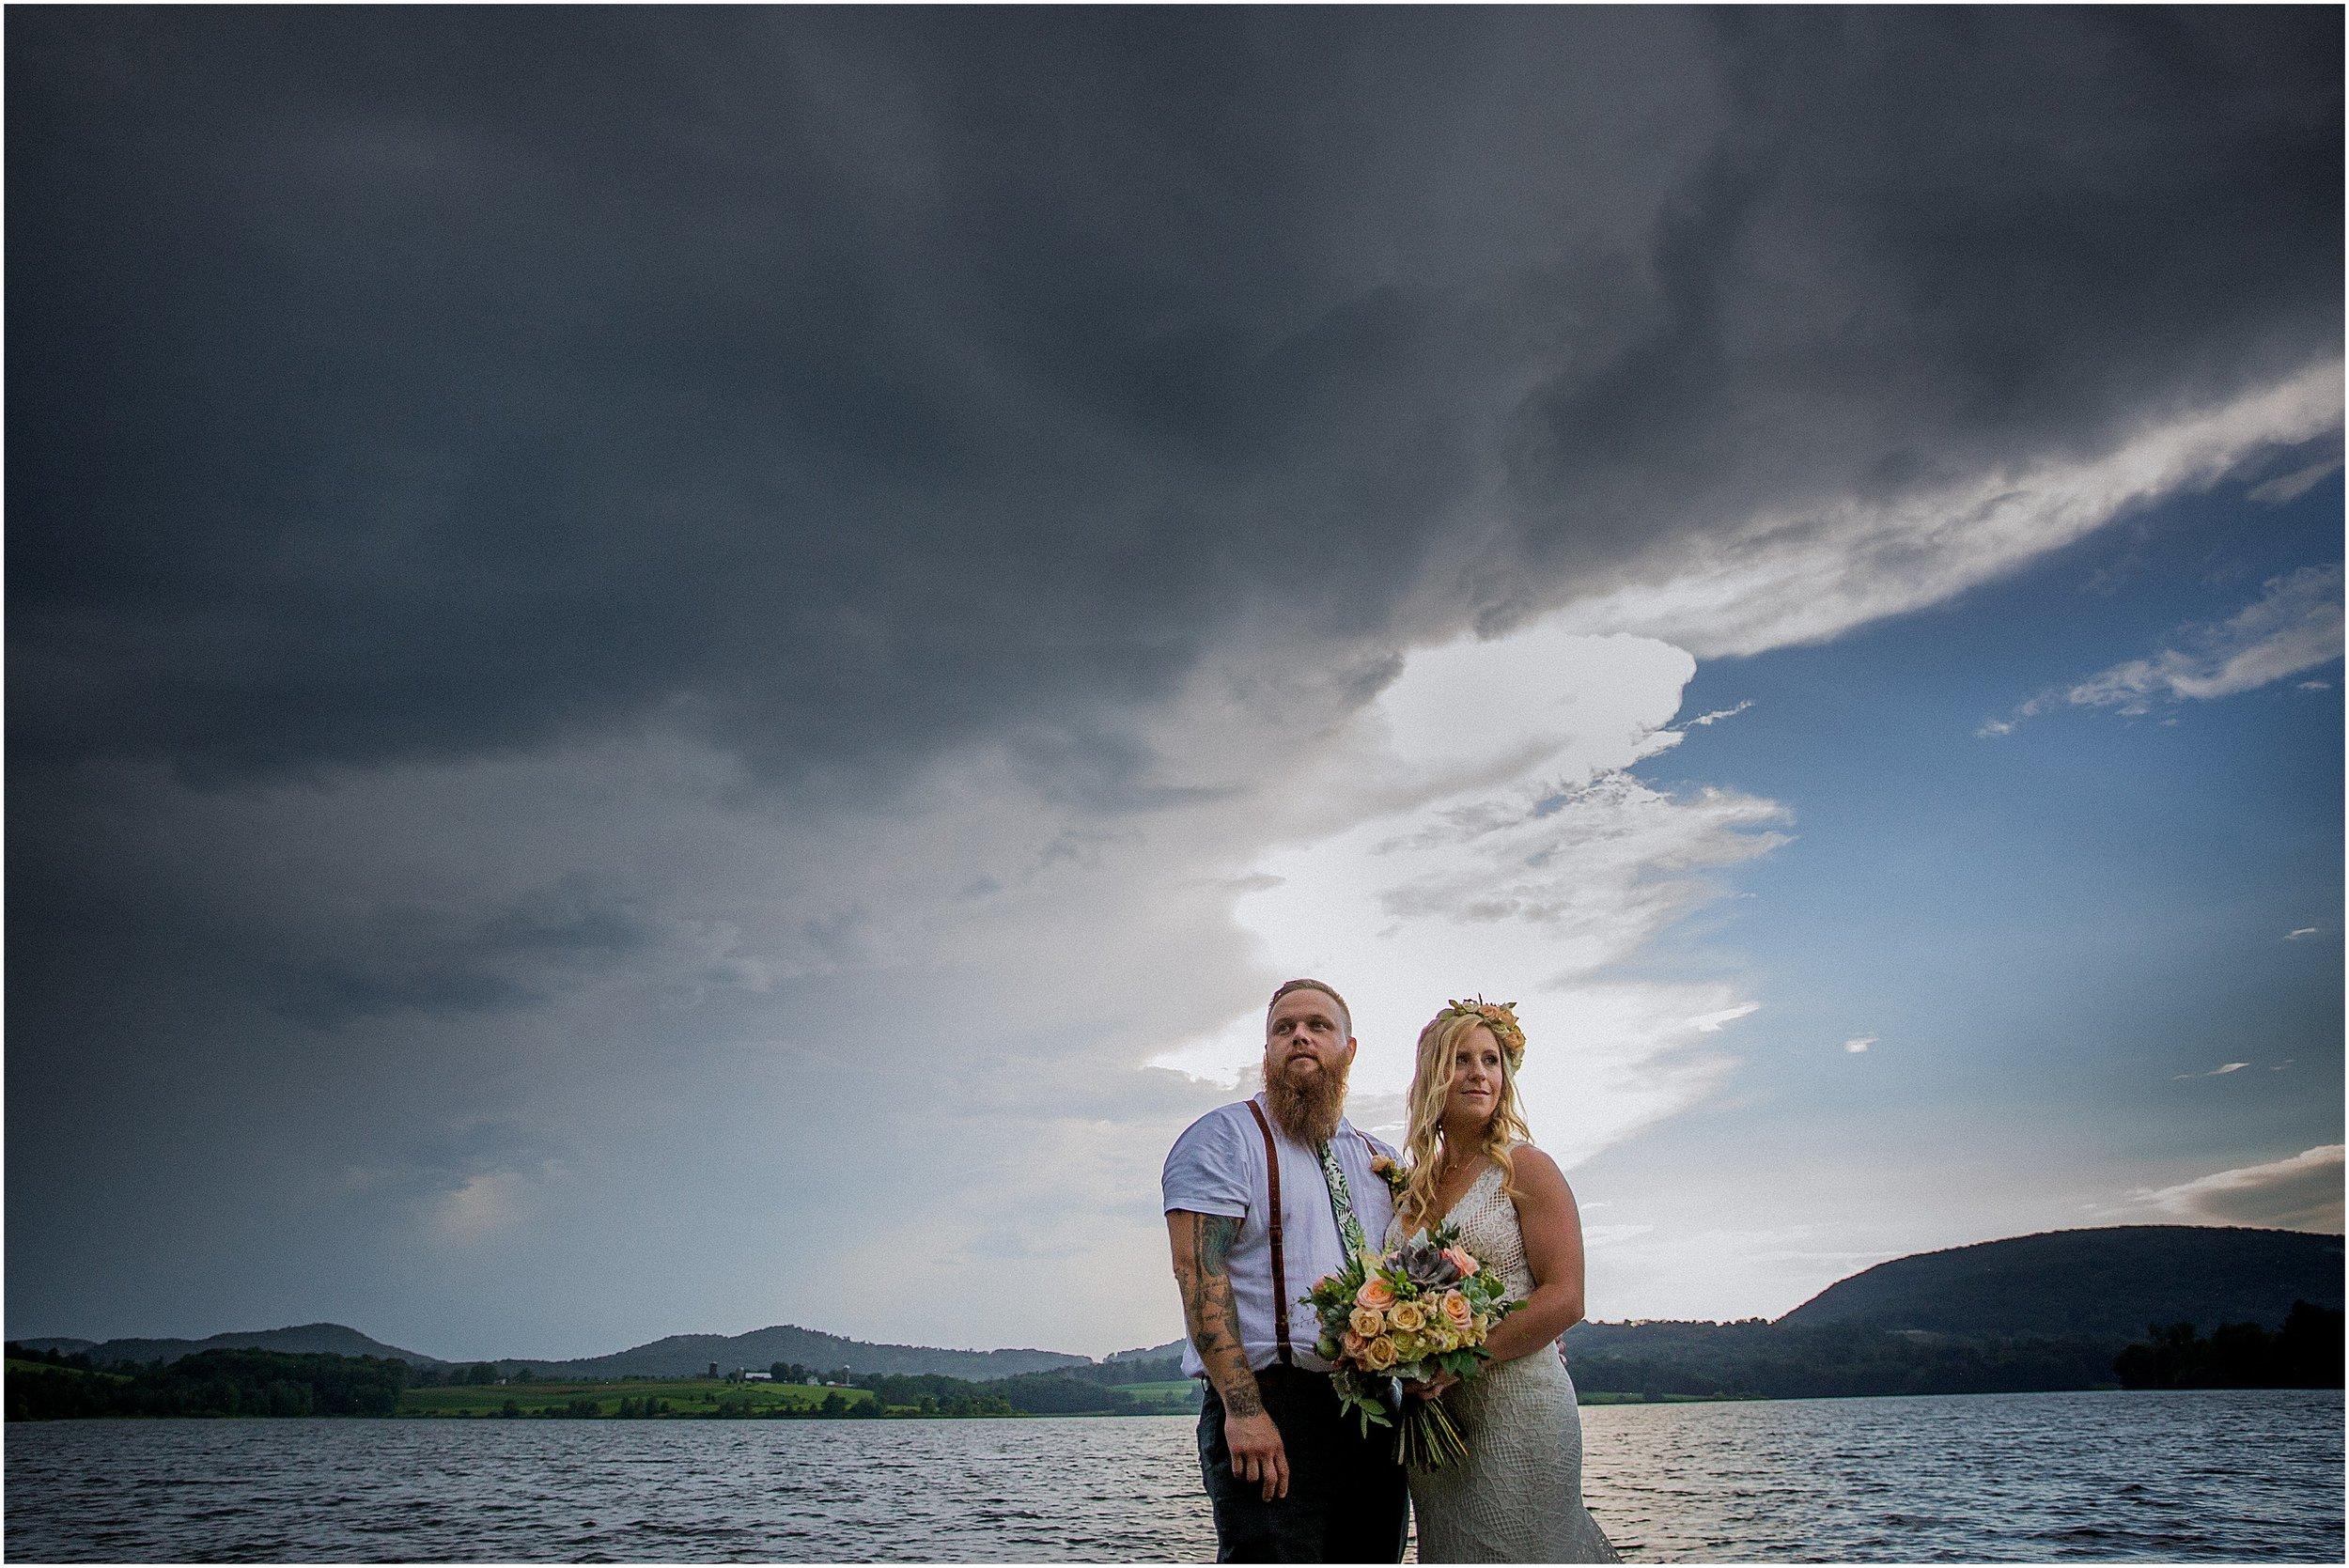 Rose_Valley_Lake_Wedding_Photographer_0038.jpg